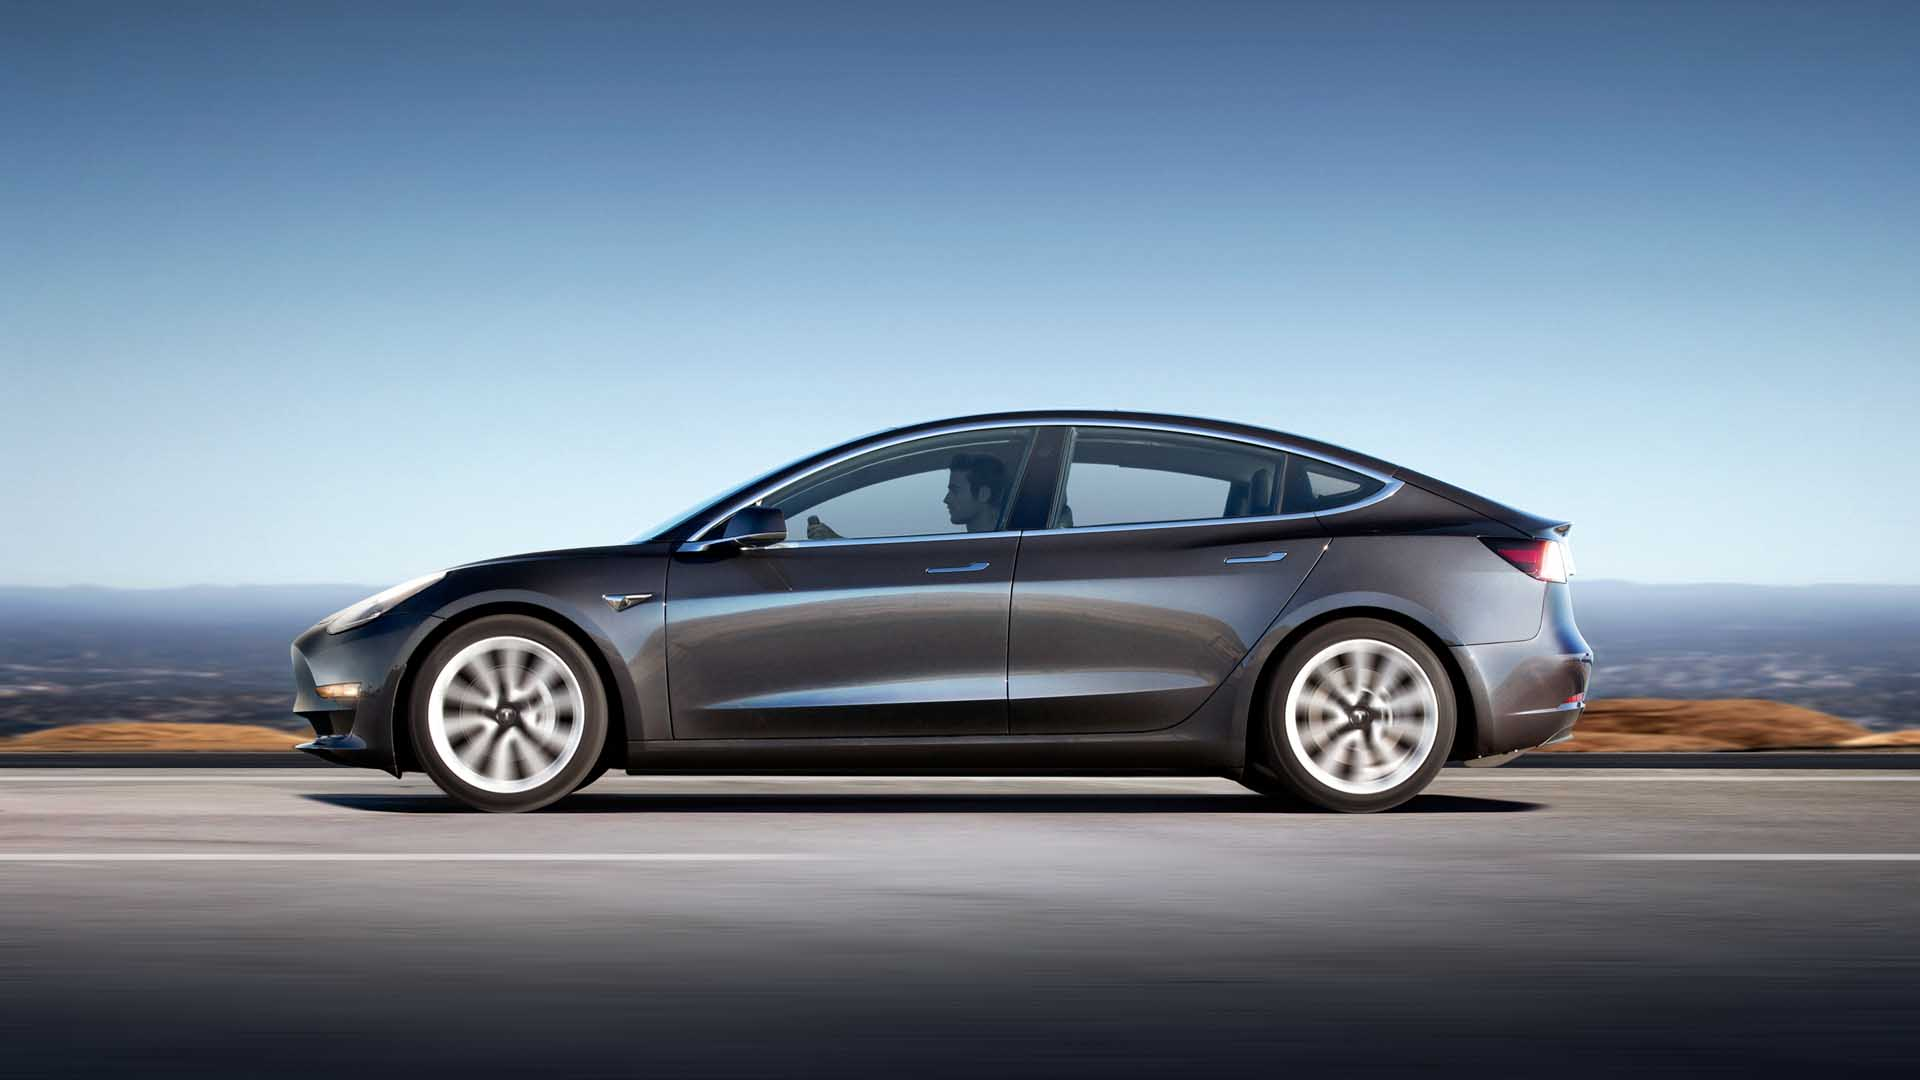 View 2020 Tesla Model 3 Images